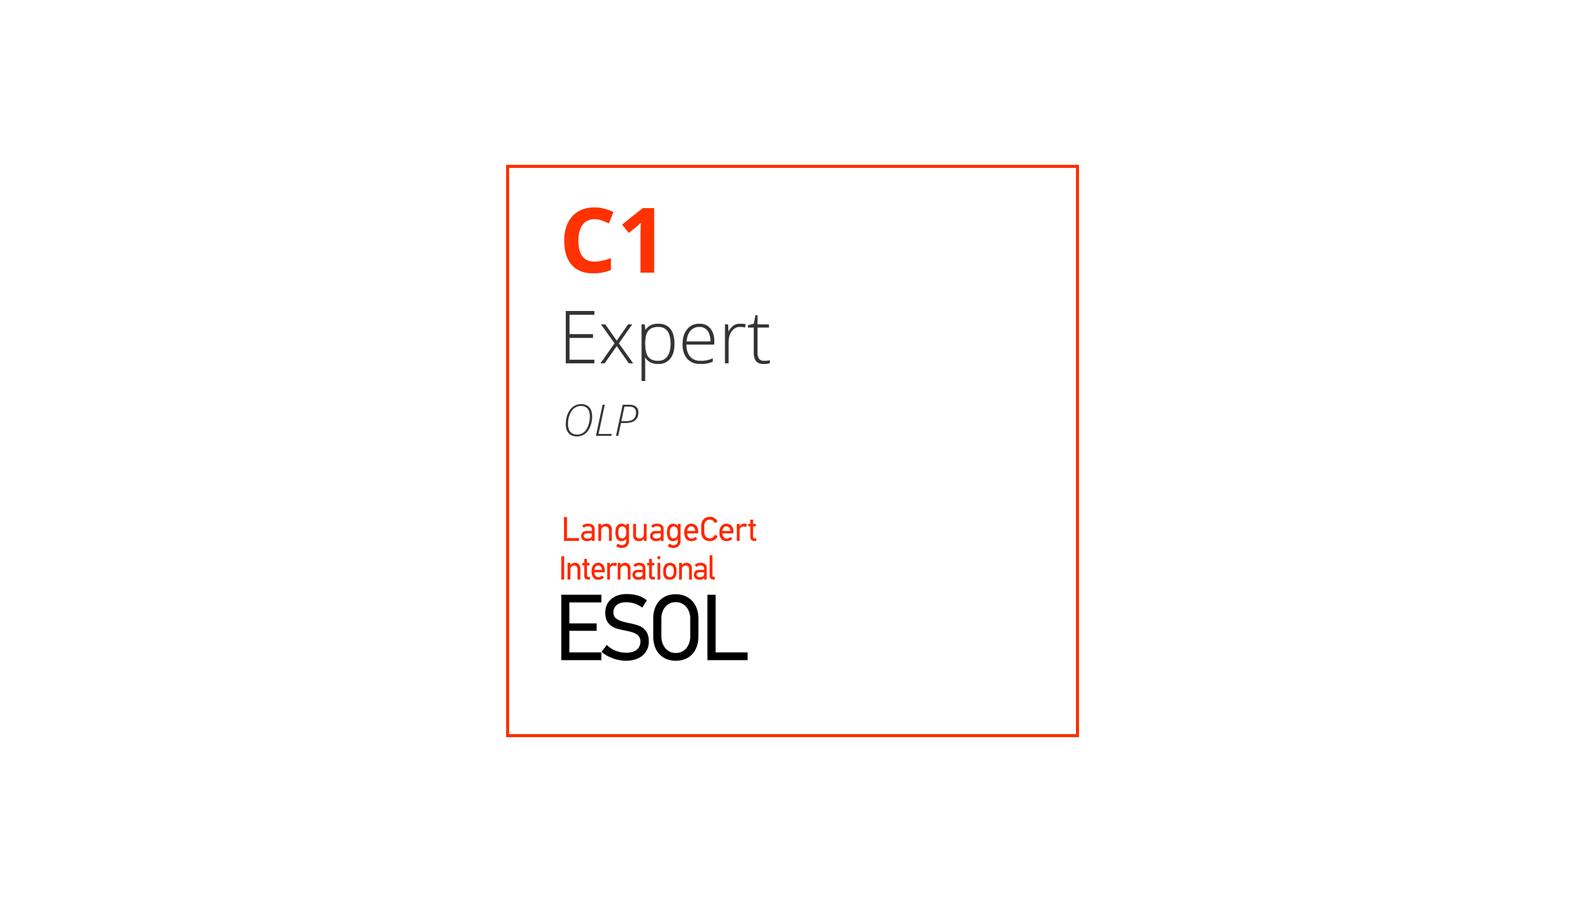 Esame di inglese online C1 LanguageCert International ESOL